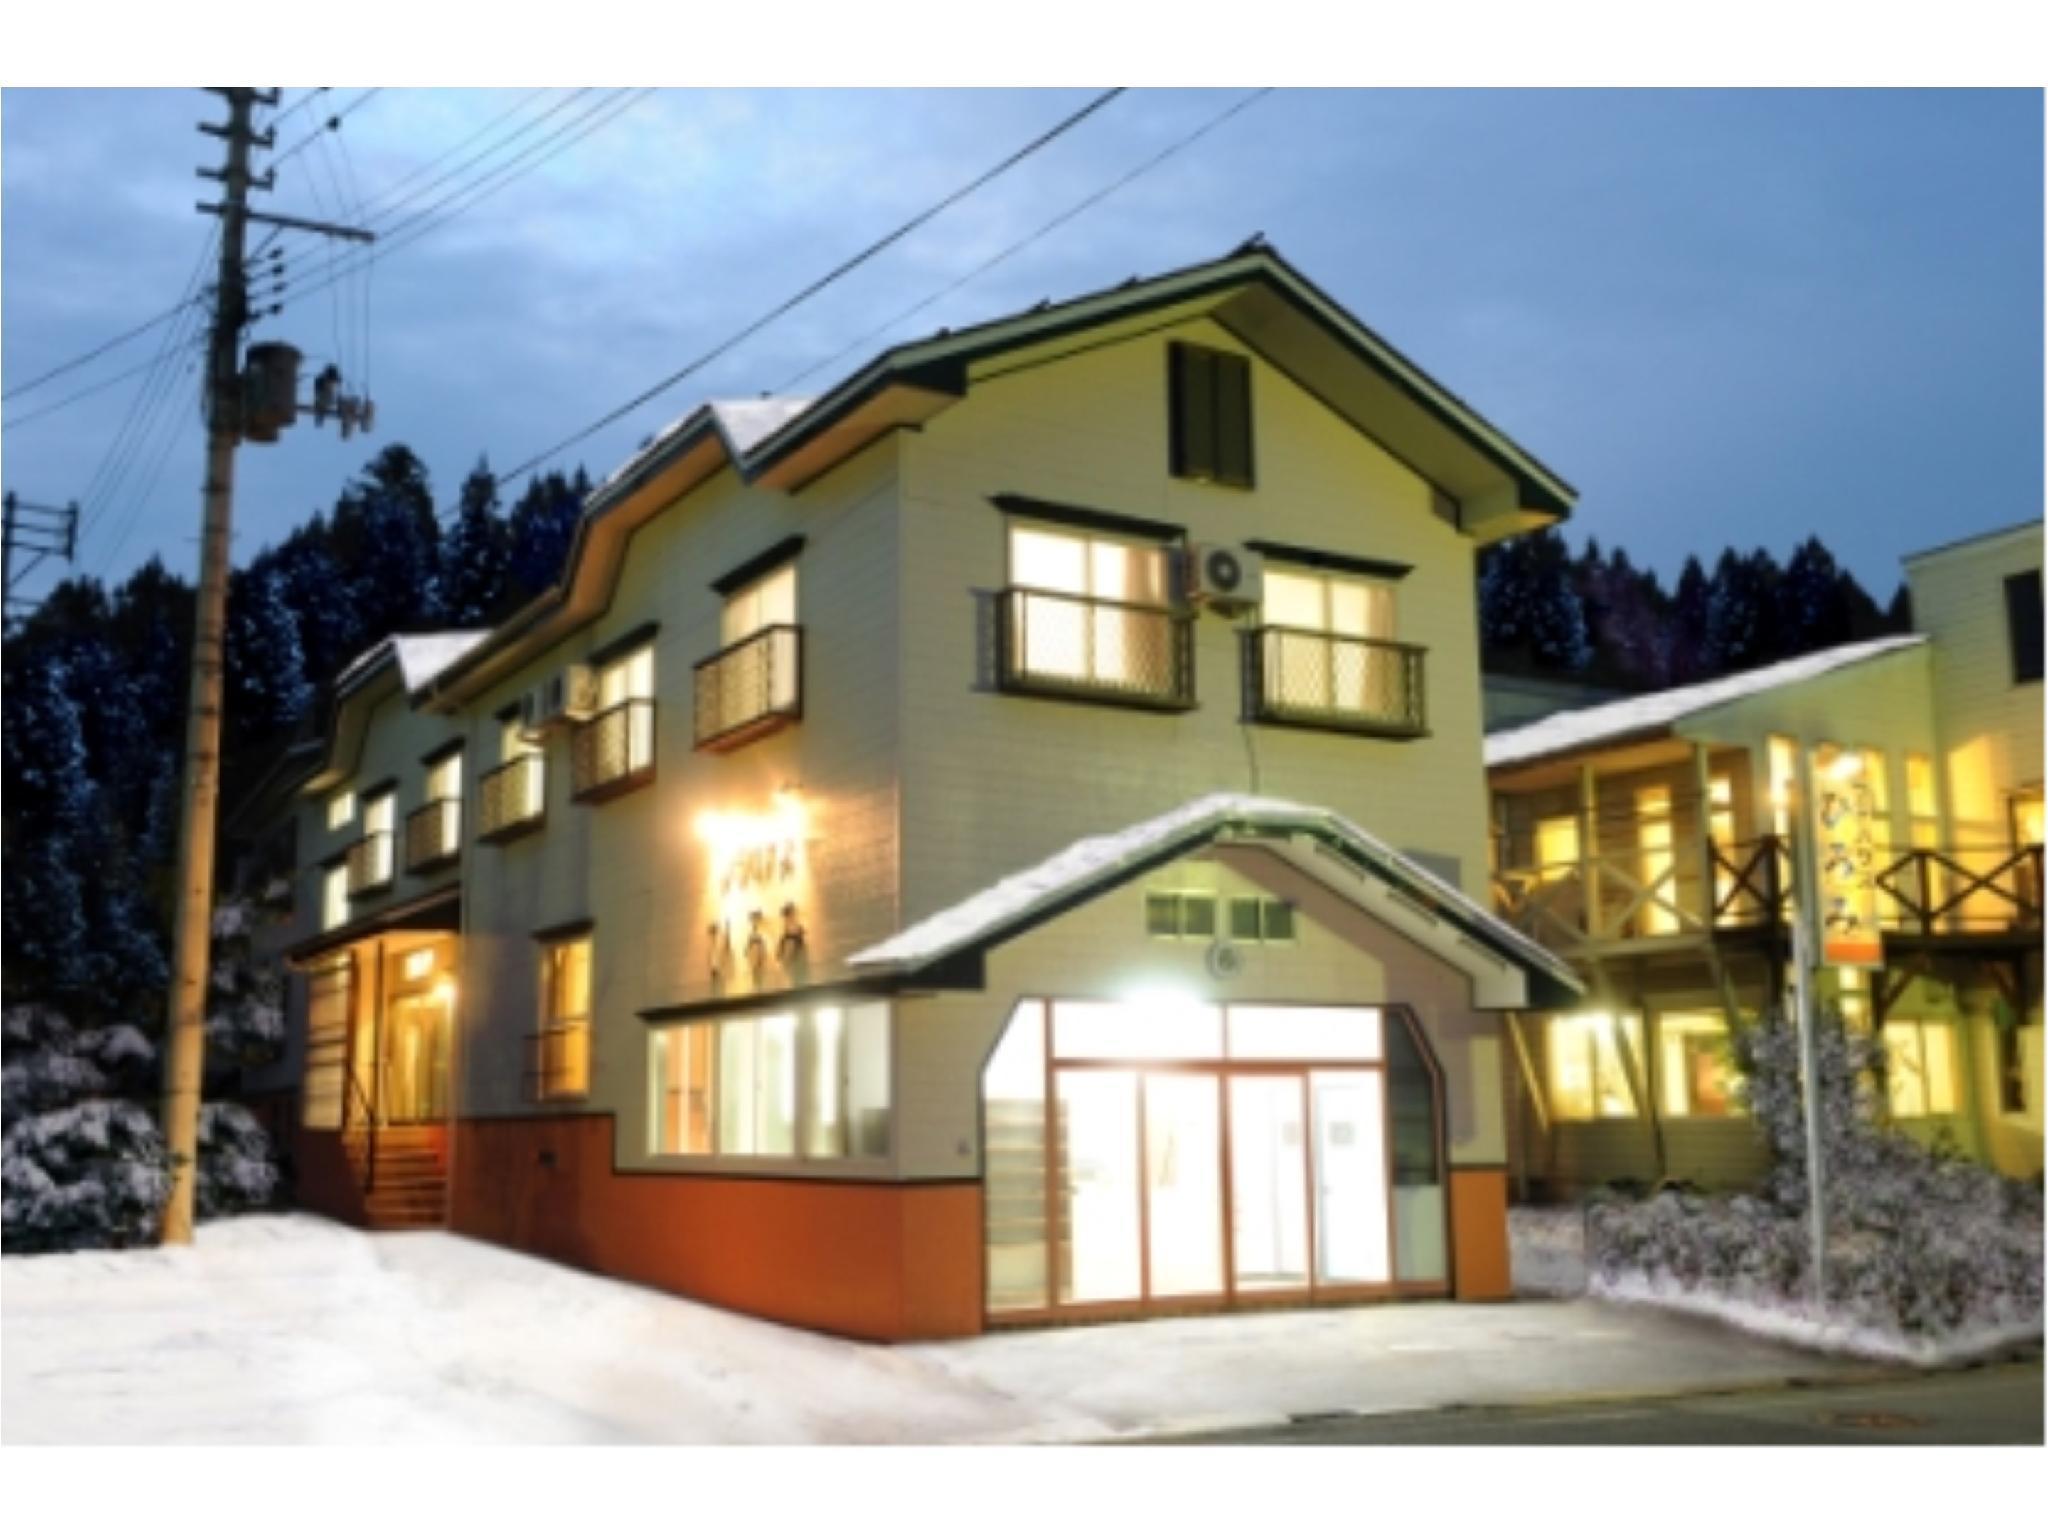 Petit House Hiromi, Minamiuonuma